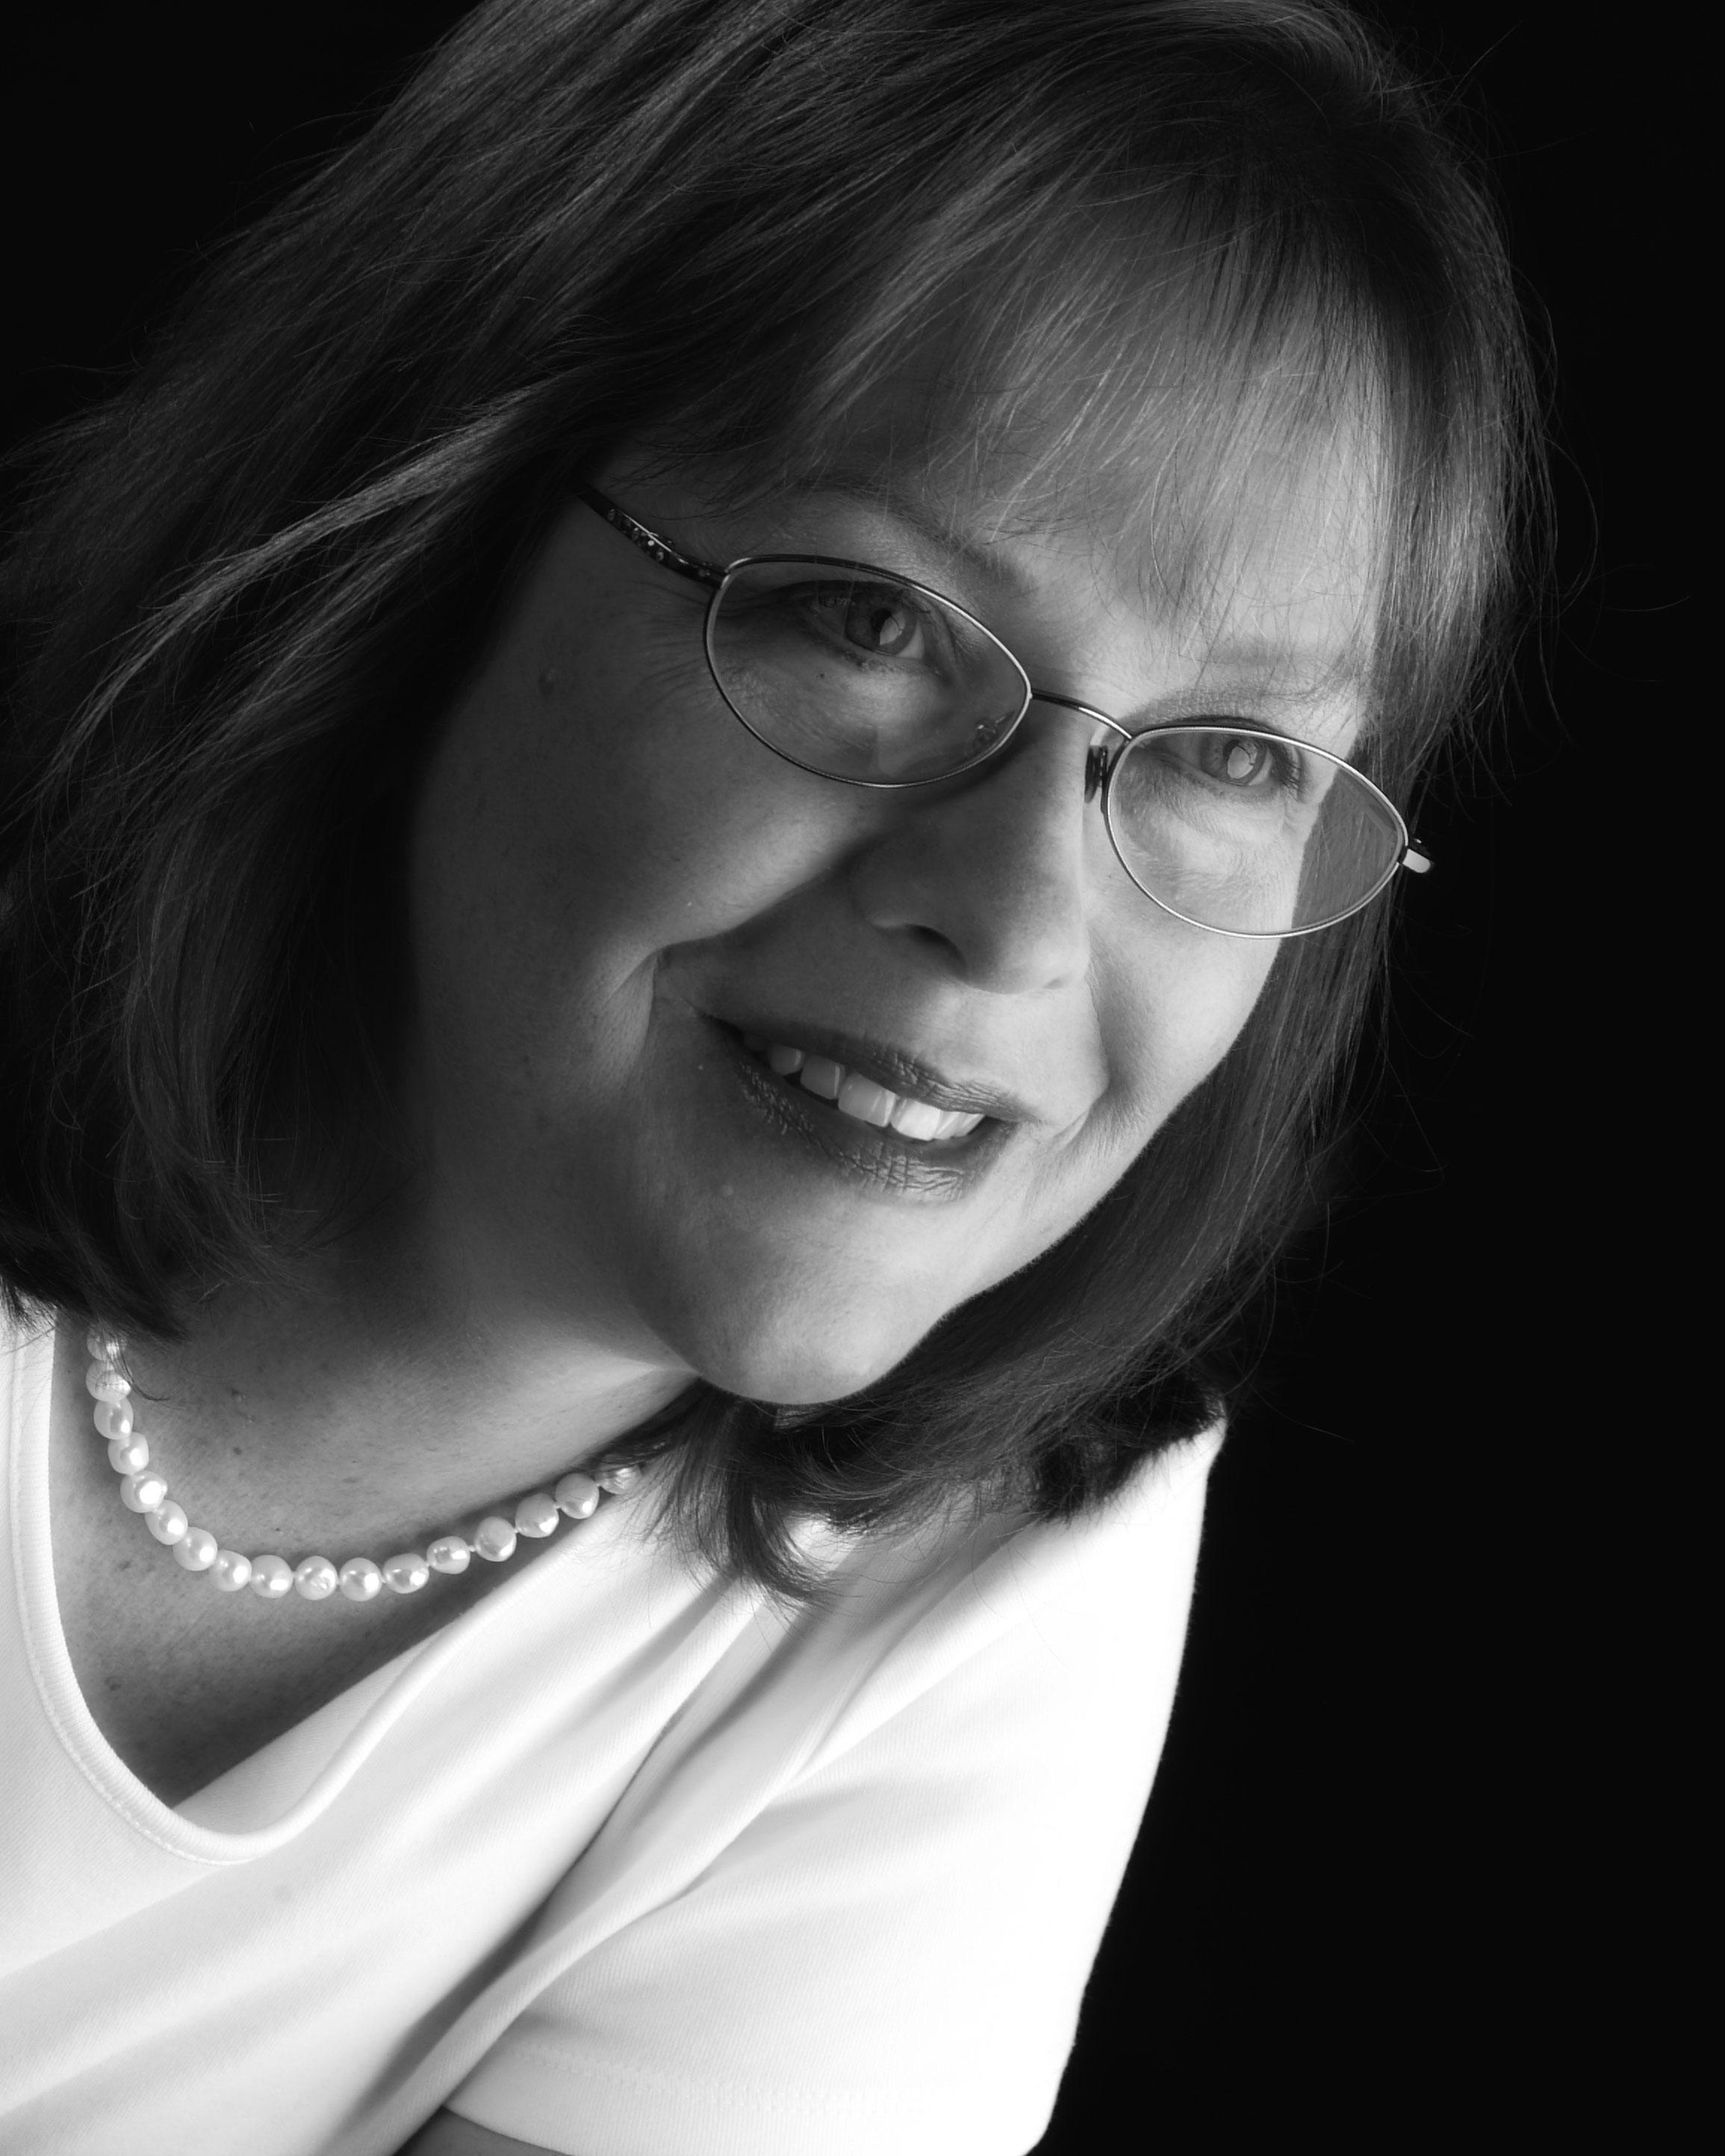 Debbie Johnson ABR, CRS, ePRO, GRI, SFR